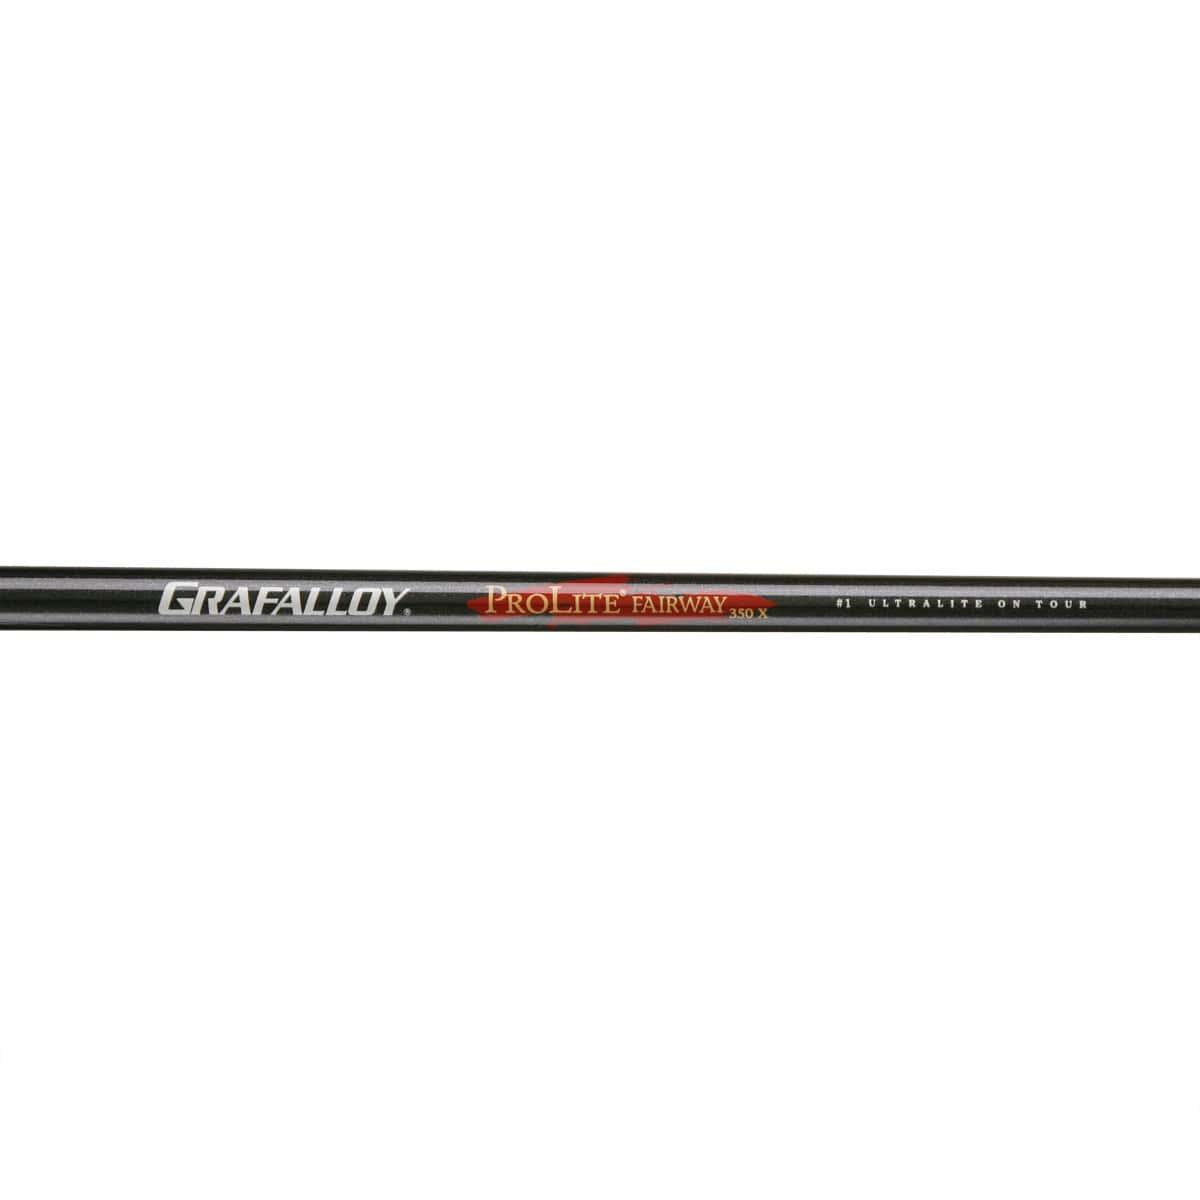 Grafalloy Prolite Fairway 0.350 Graphite Golf Shaft